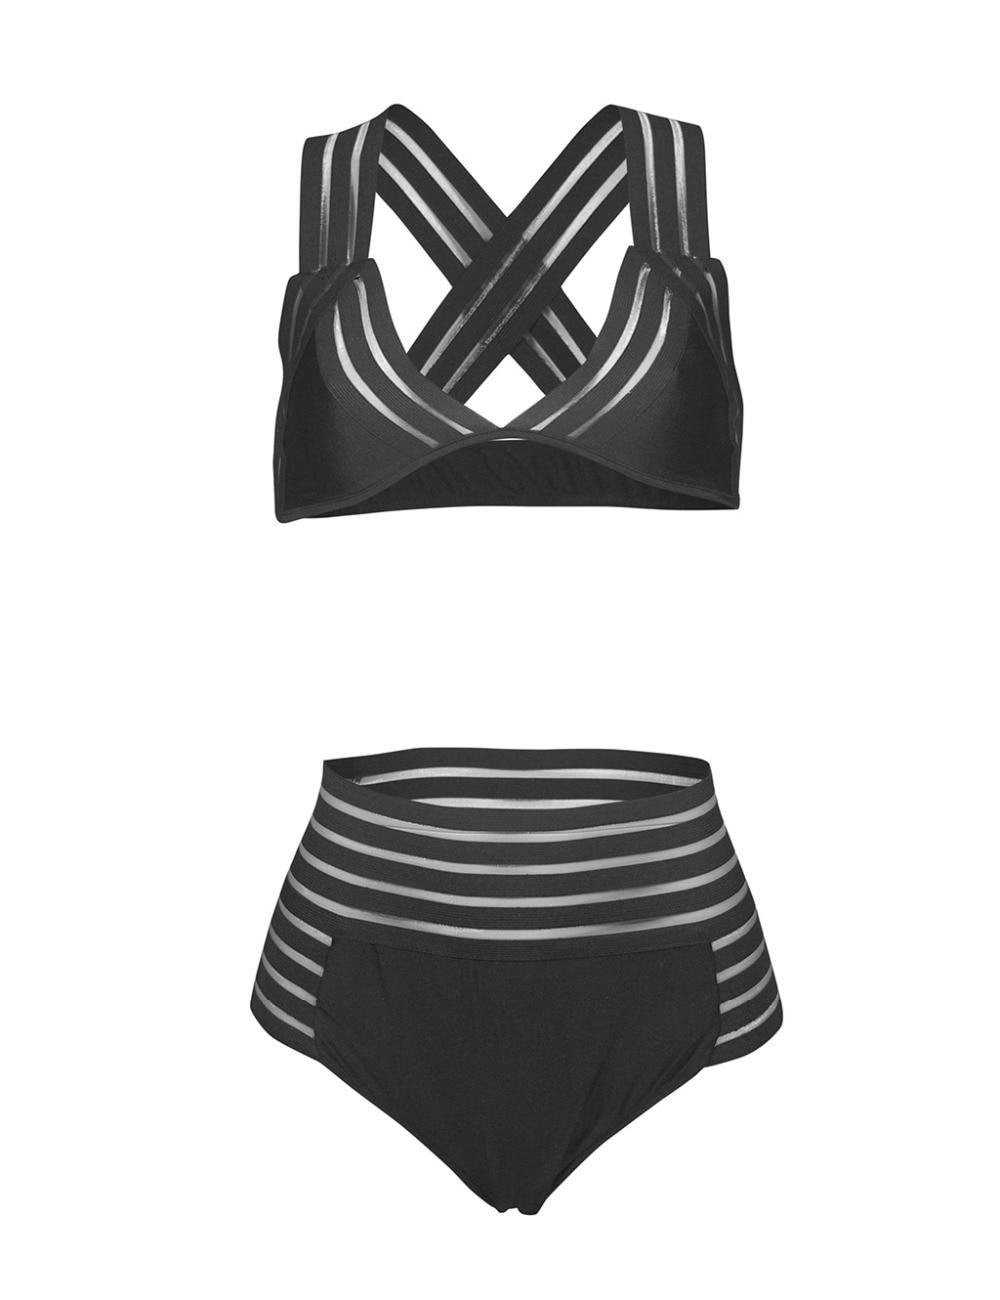 2018 Taille Haute Dépouillé Évider Net Bikini Ensemble Maillot de Bain Maillot de bain Maillots De Bain